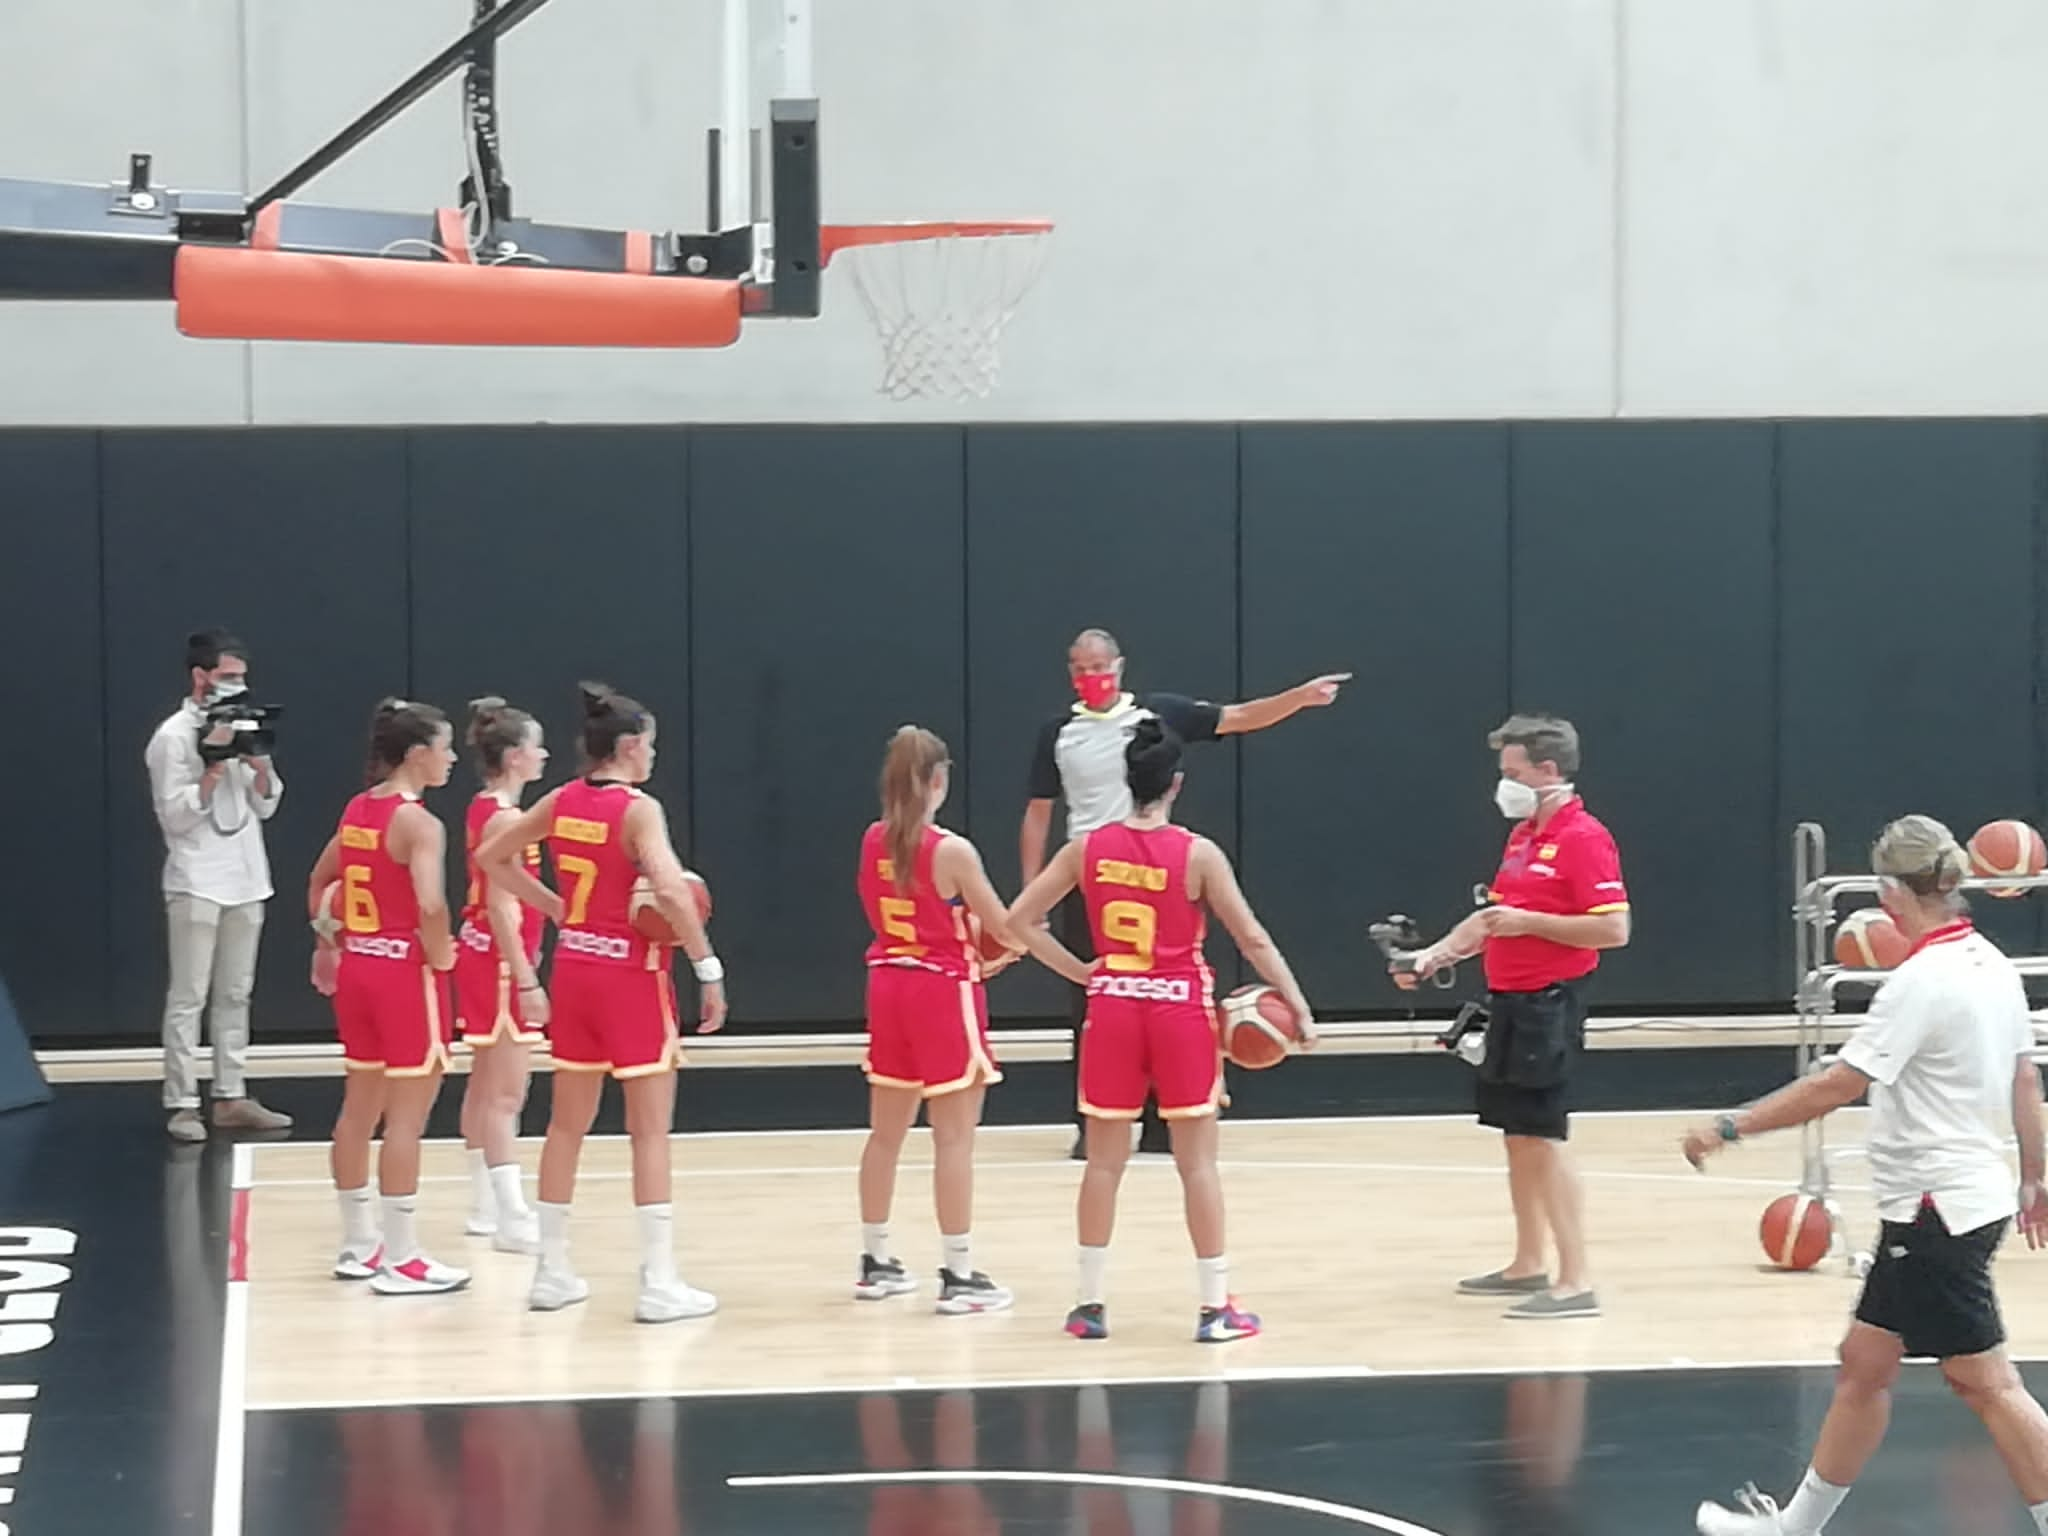 [VÍDEO] La U17 Femenina no jugará la final del FIBA Skills Challenge